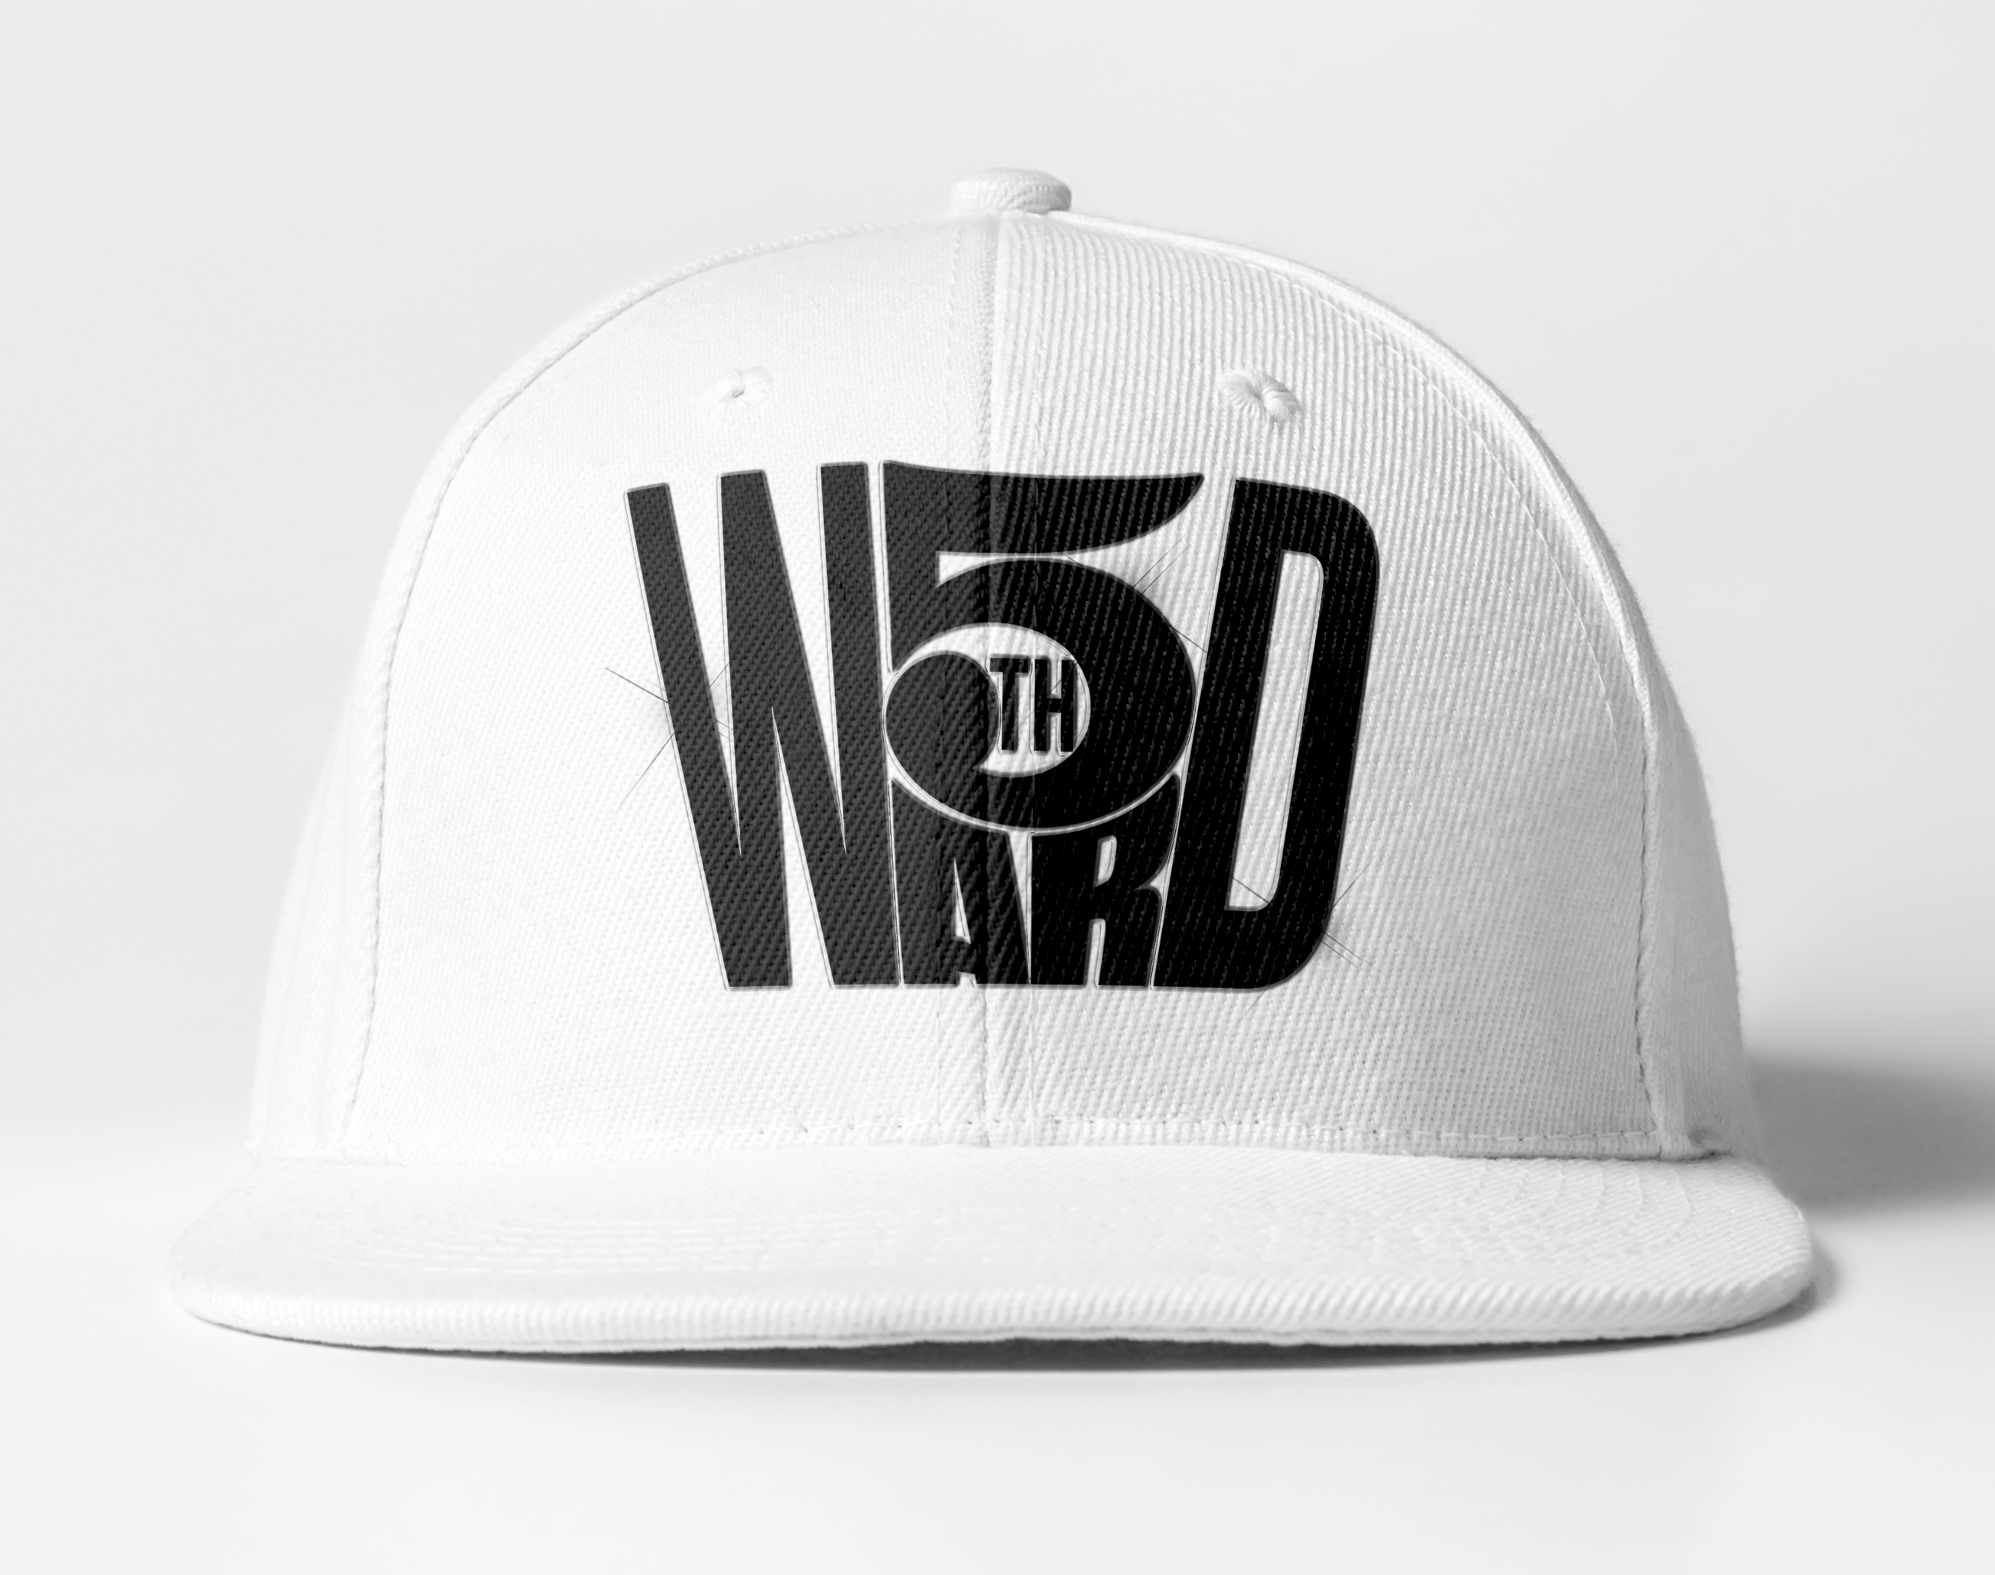 5th-ward-white-snapback.jpg